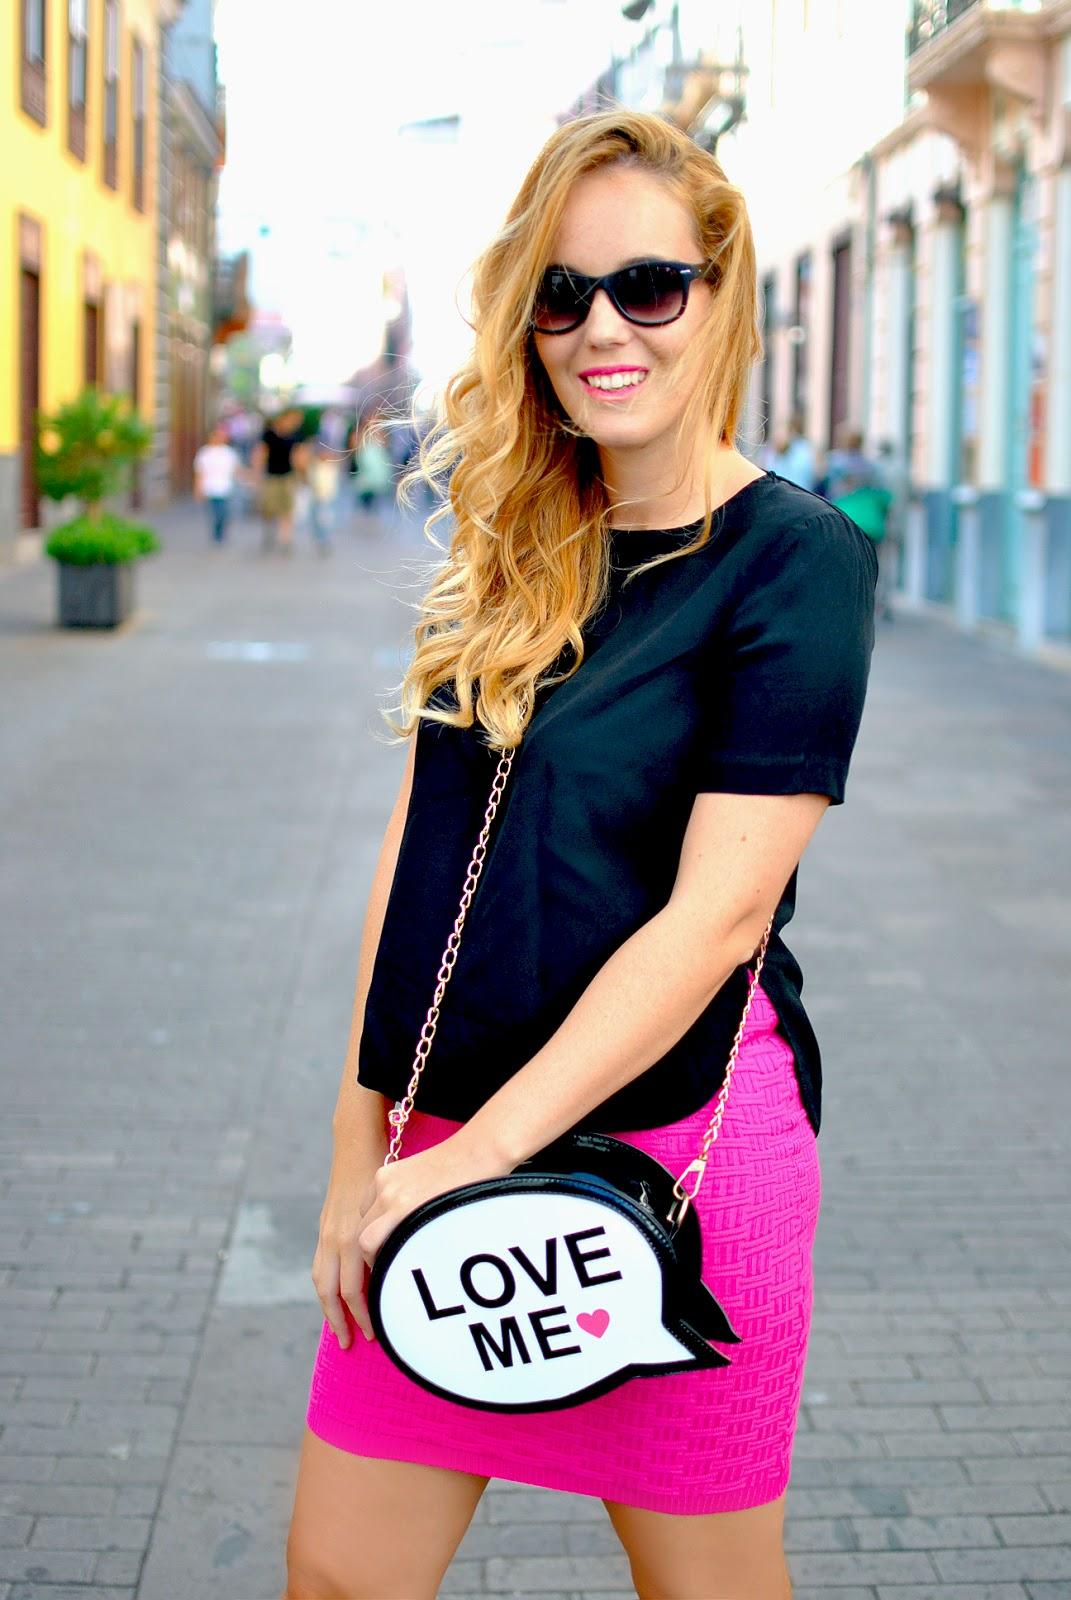 nery hdez, baggood, comic bag , oasap skirt, sunglass junkie, wayfarer sunglasses